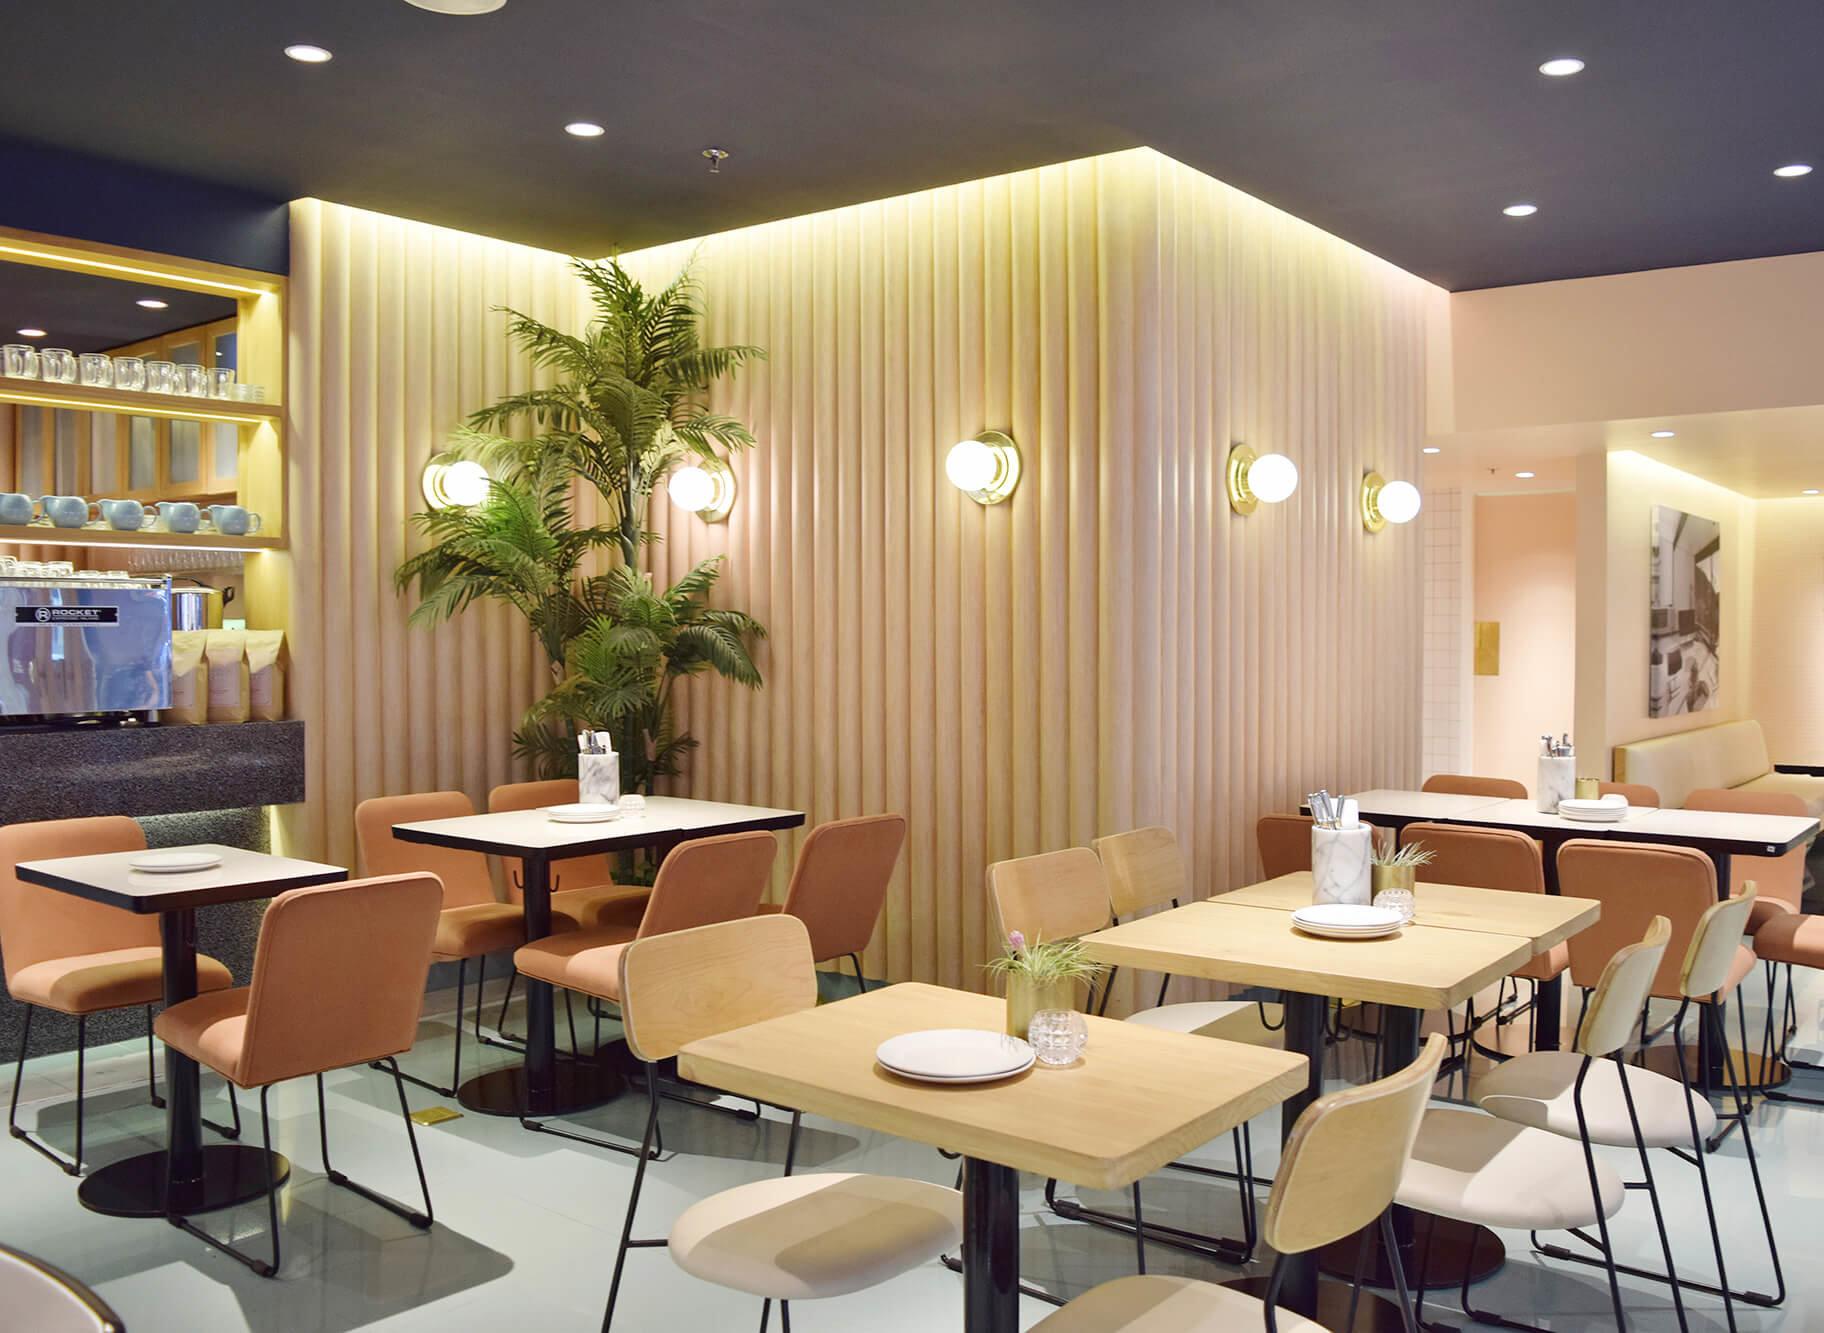 Sunnies Cafe Sm Megamall Mandaluyong Metro Manila